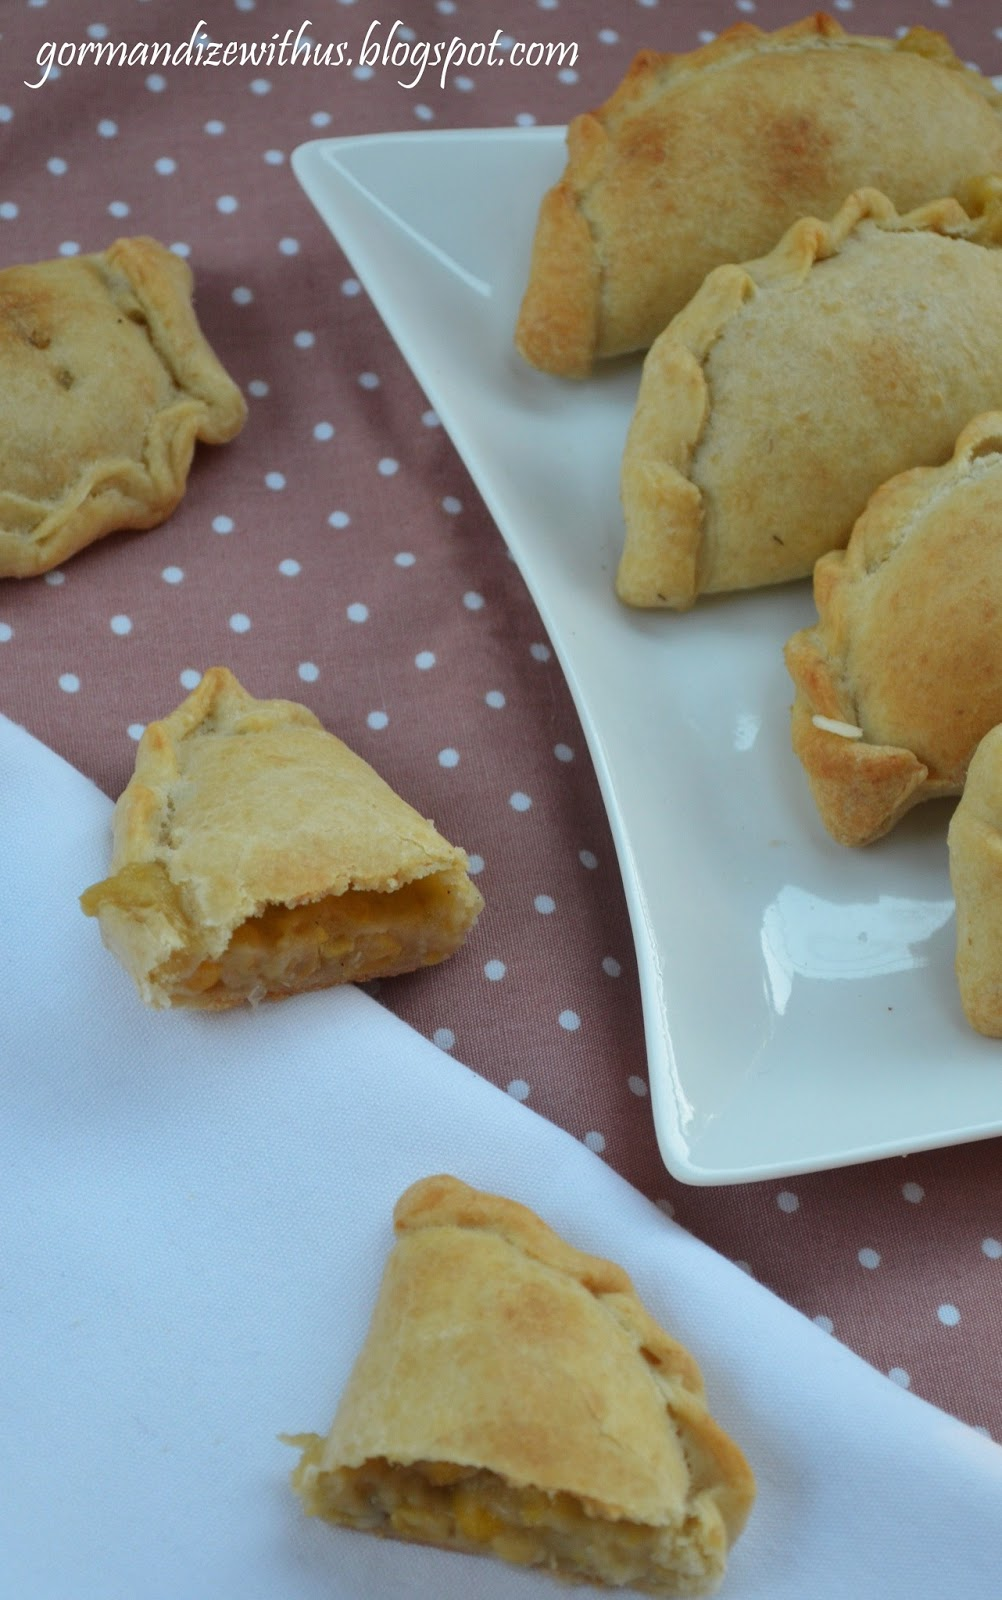 Gormandize: Argentinian Sweetcorn Empanadas